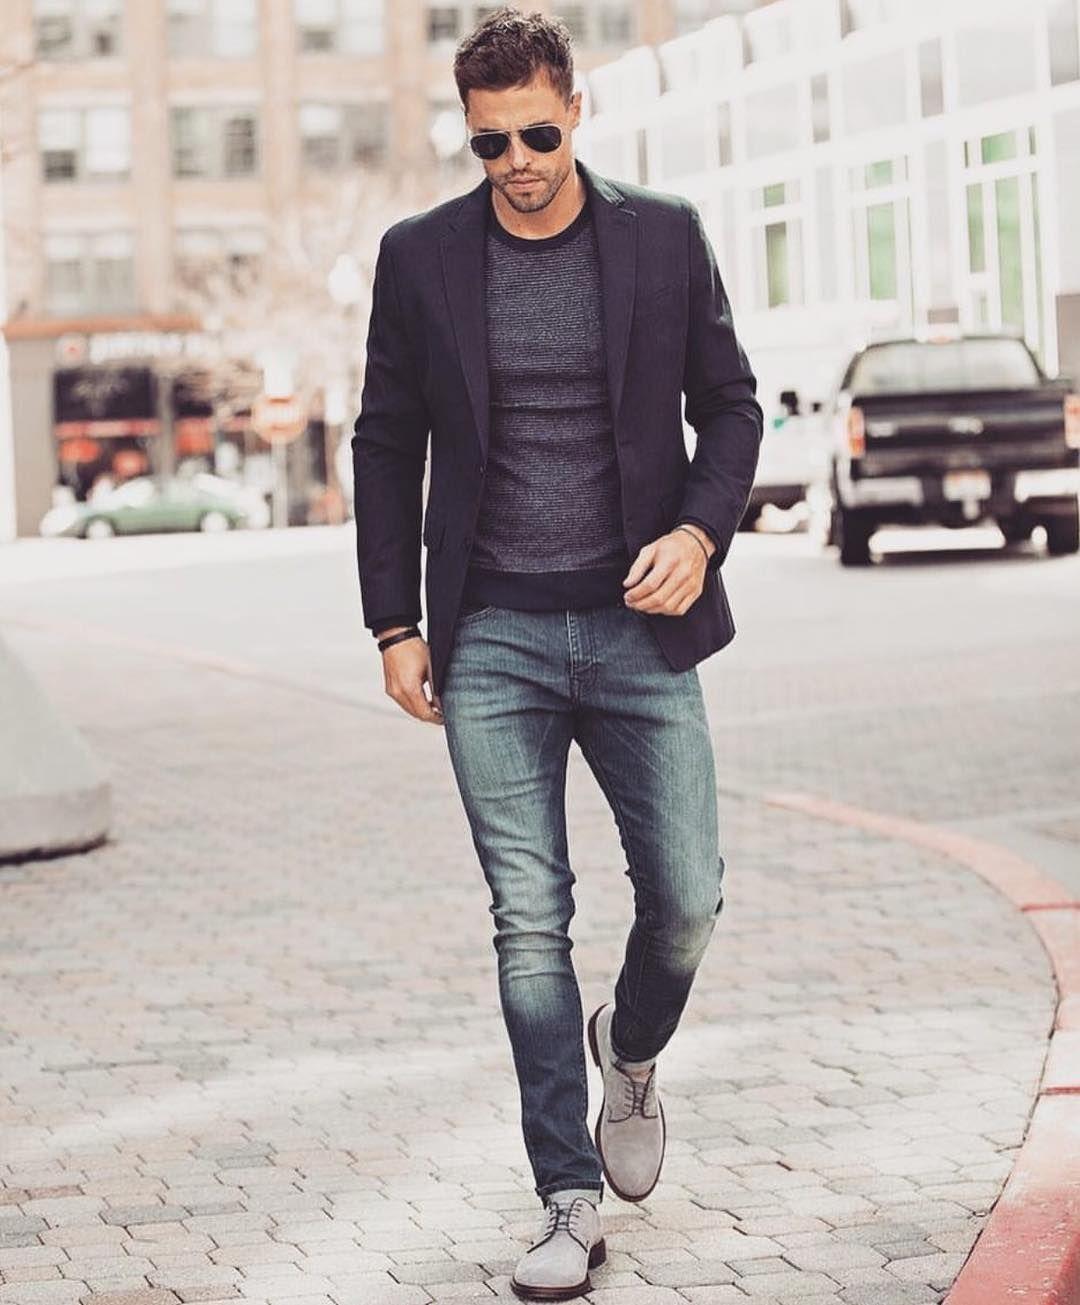 fbadb90293 We love this smart casual tech company look. A versatile navy blazer is a  wardrobe essential.  dadthreads